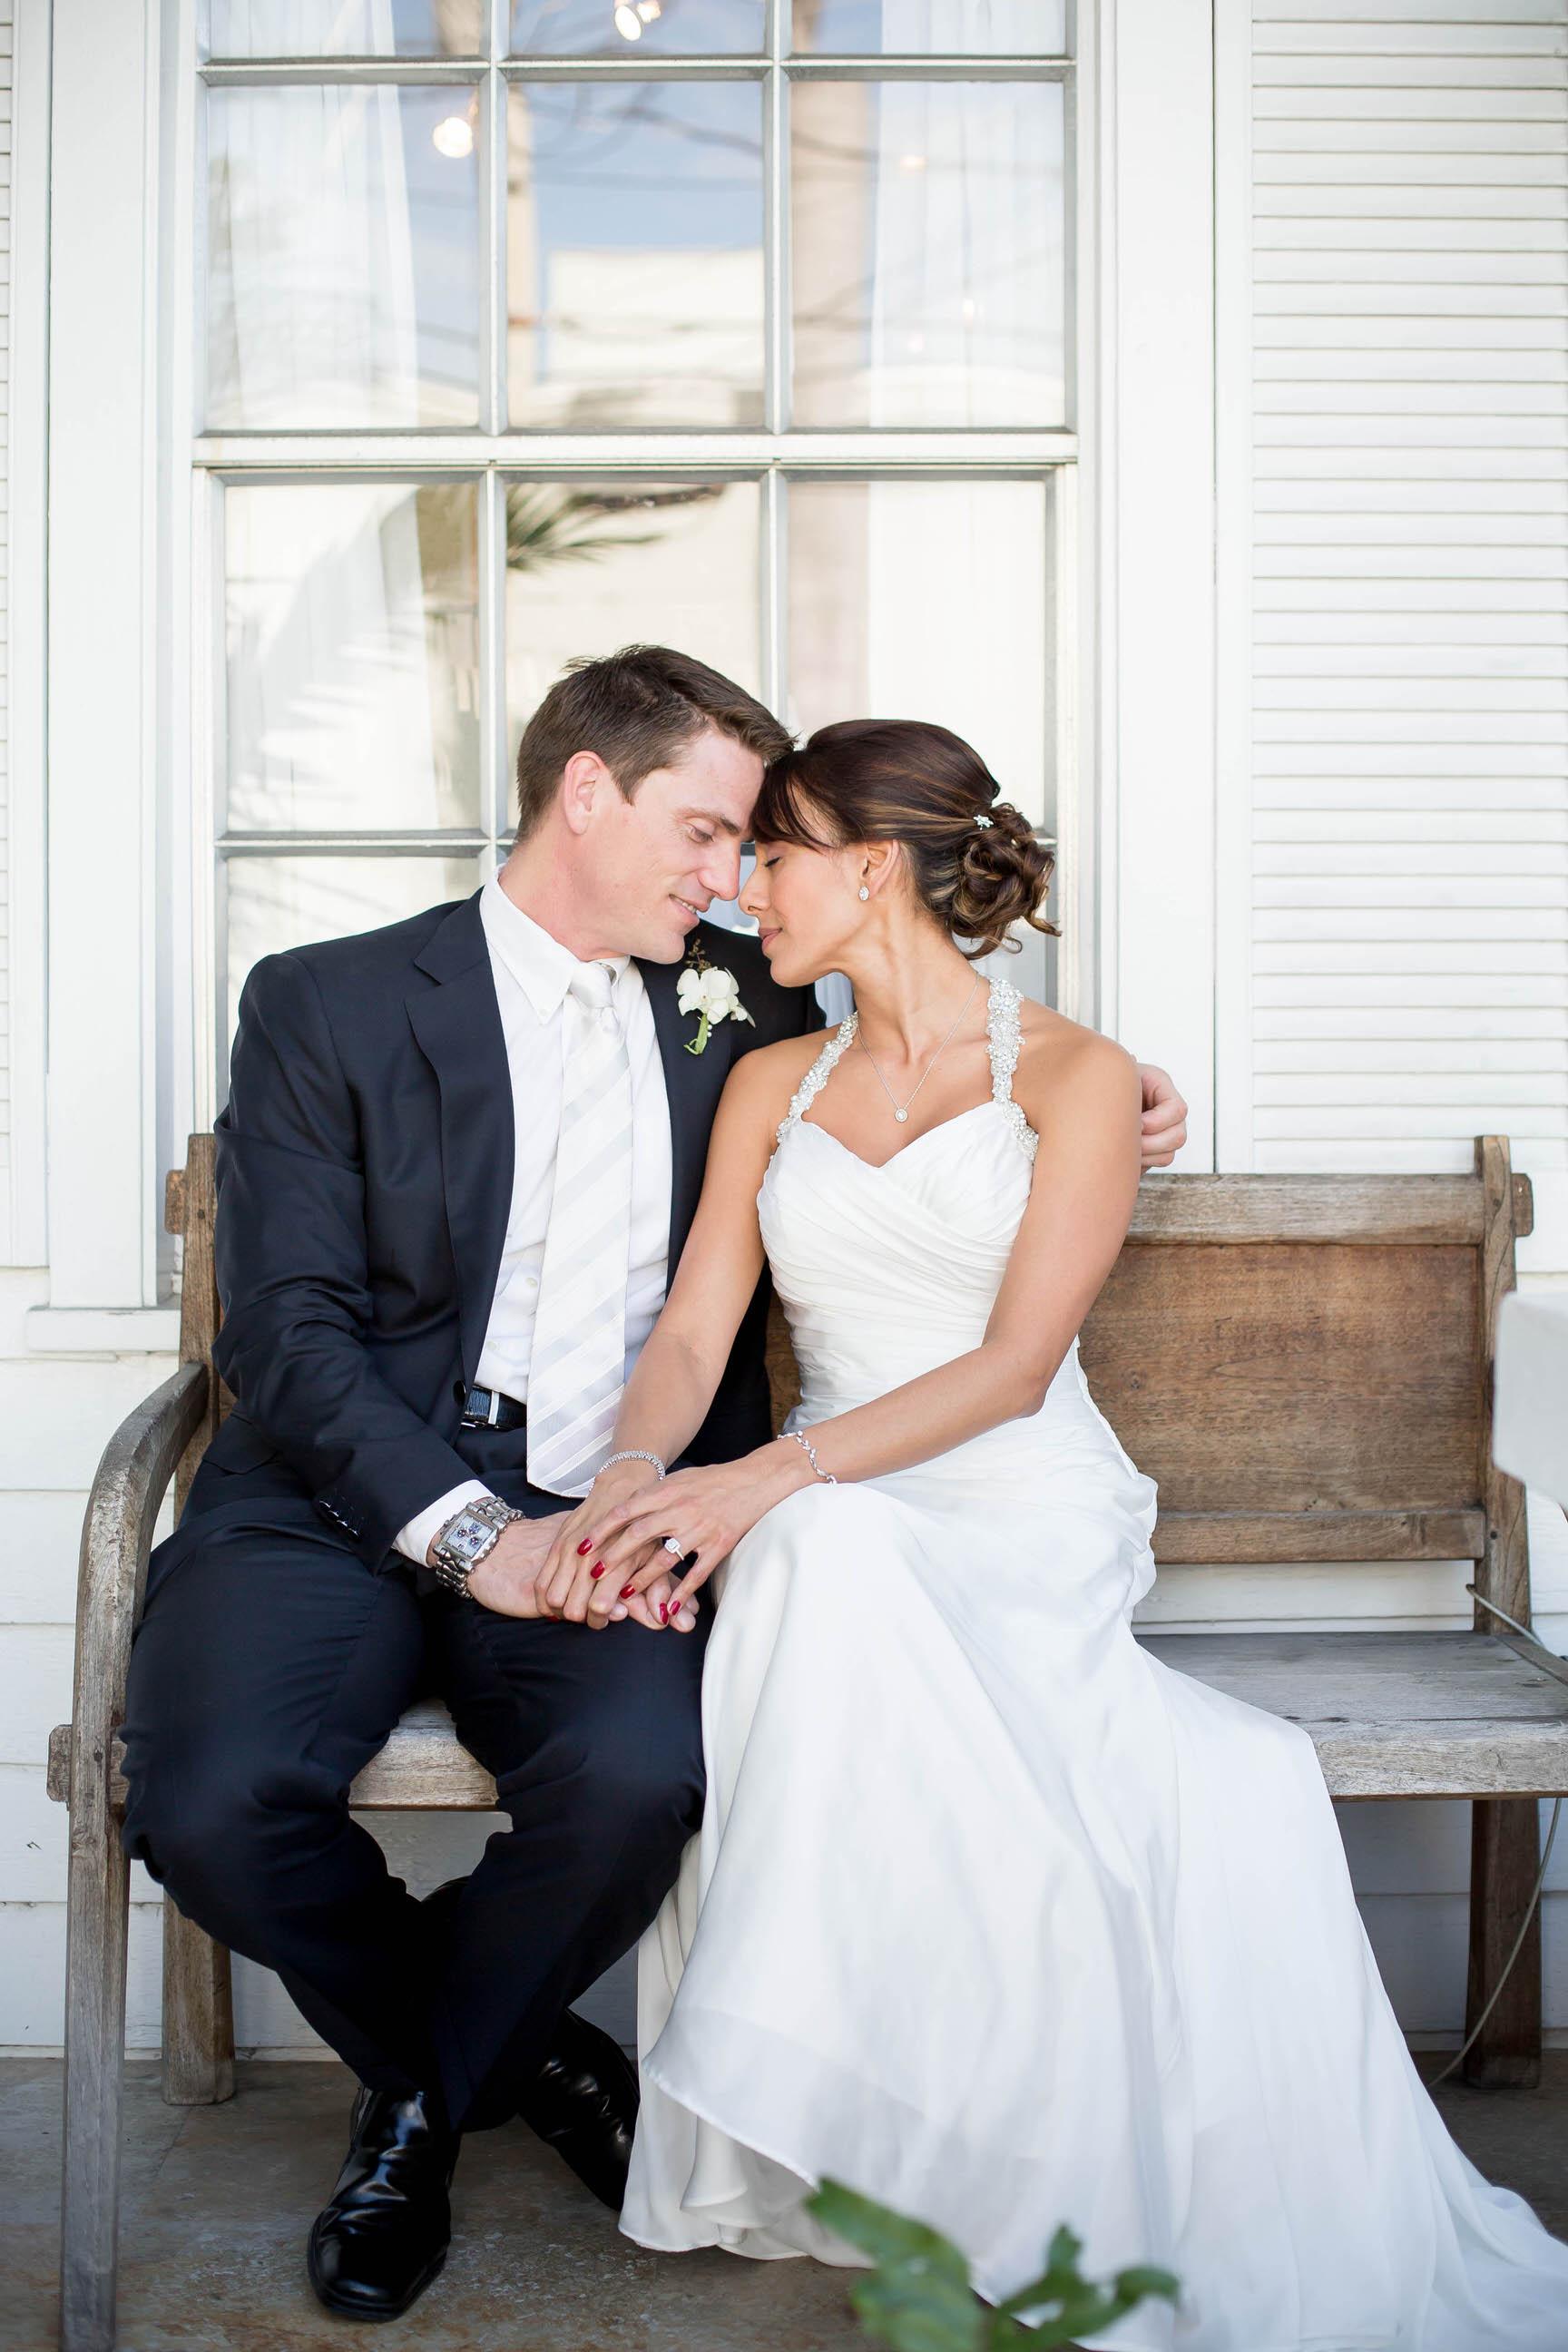 moments_authentic_intimate_wedding_photographer.jpg